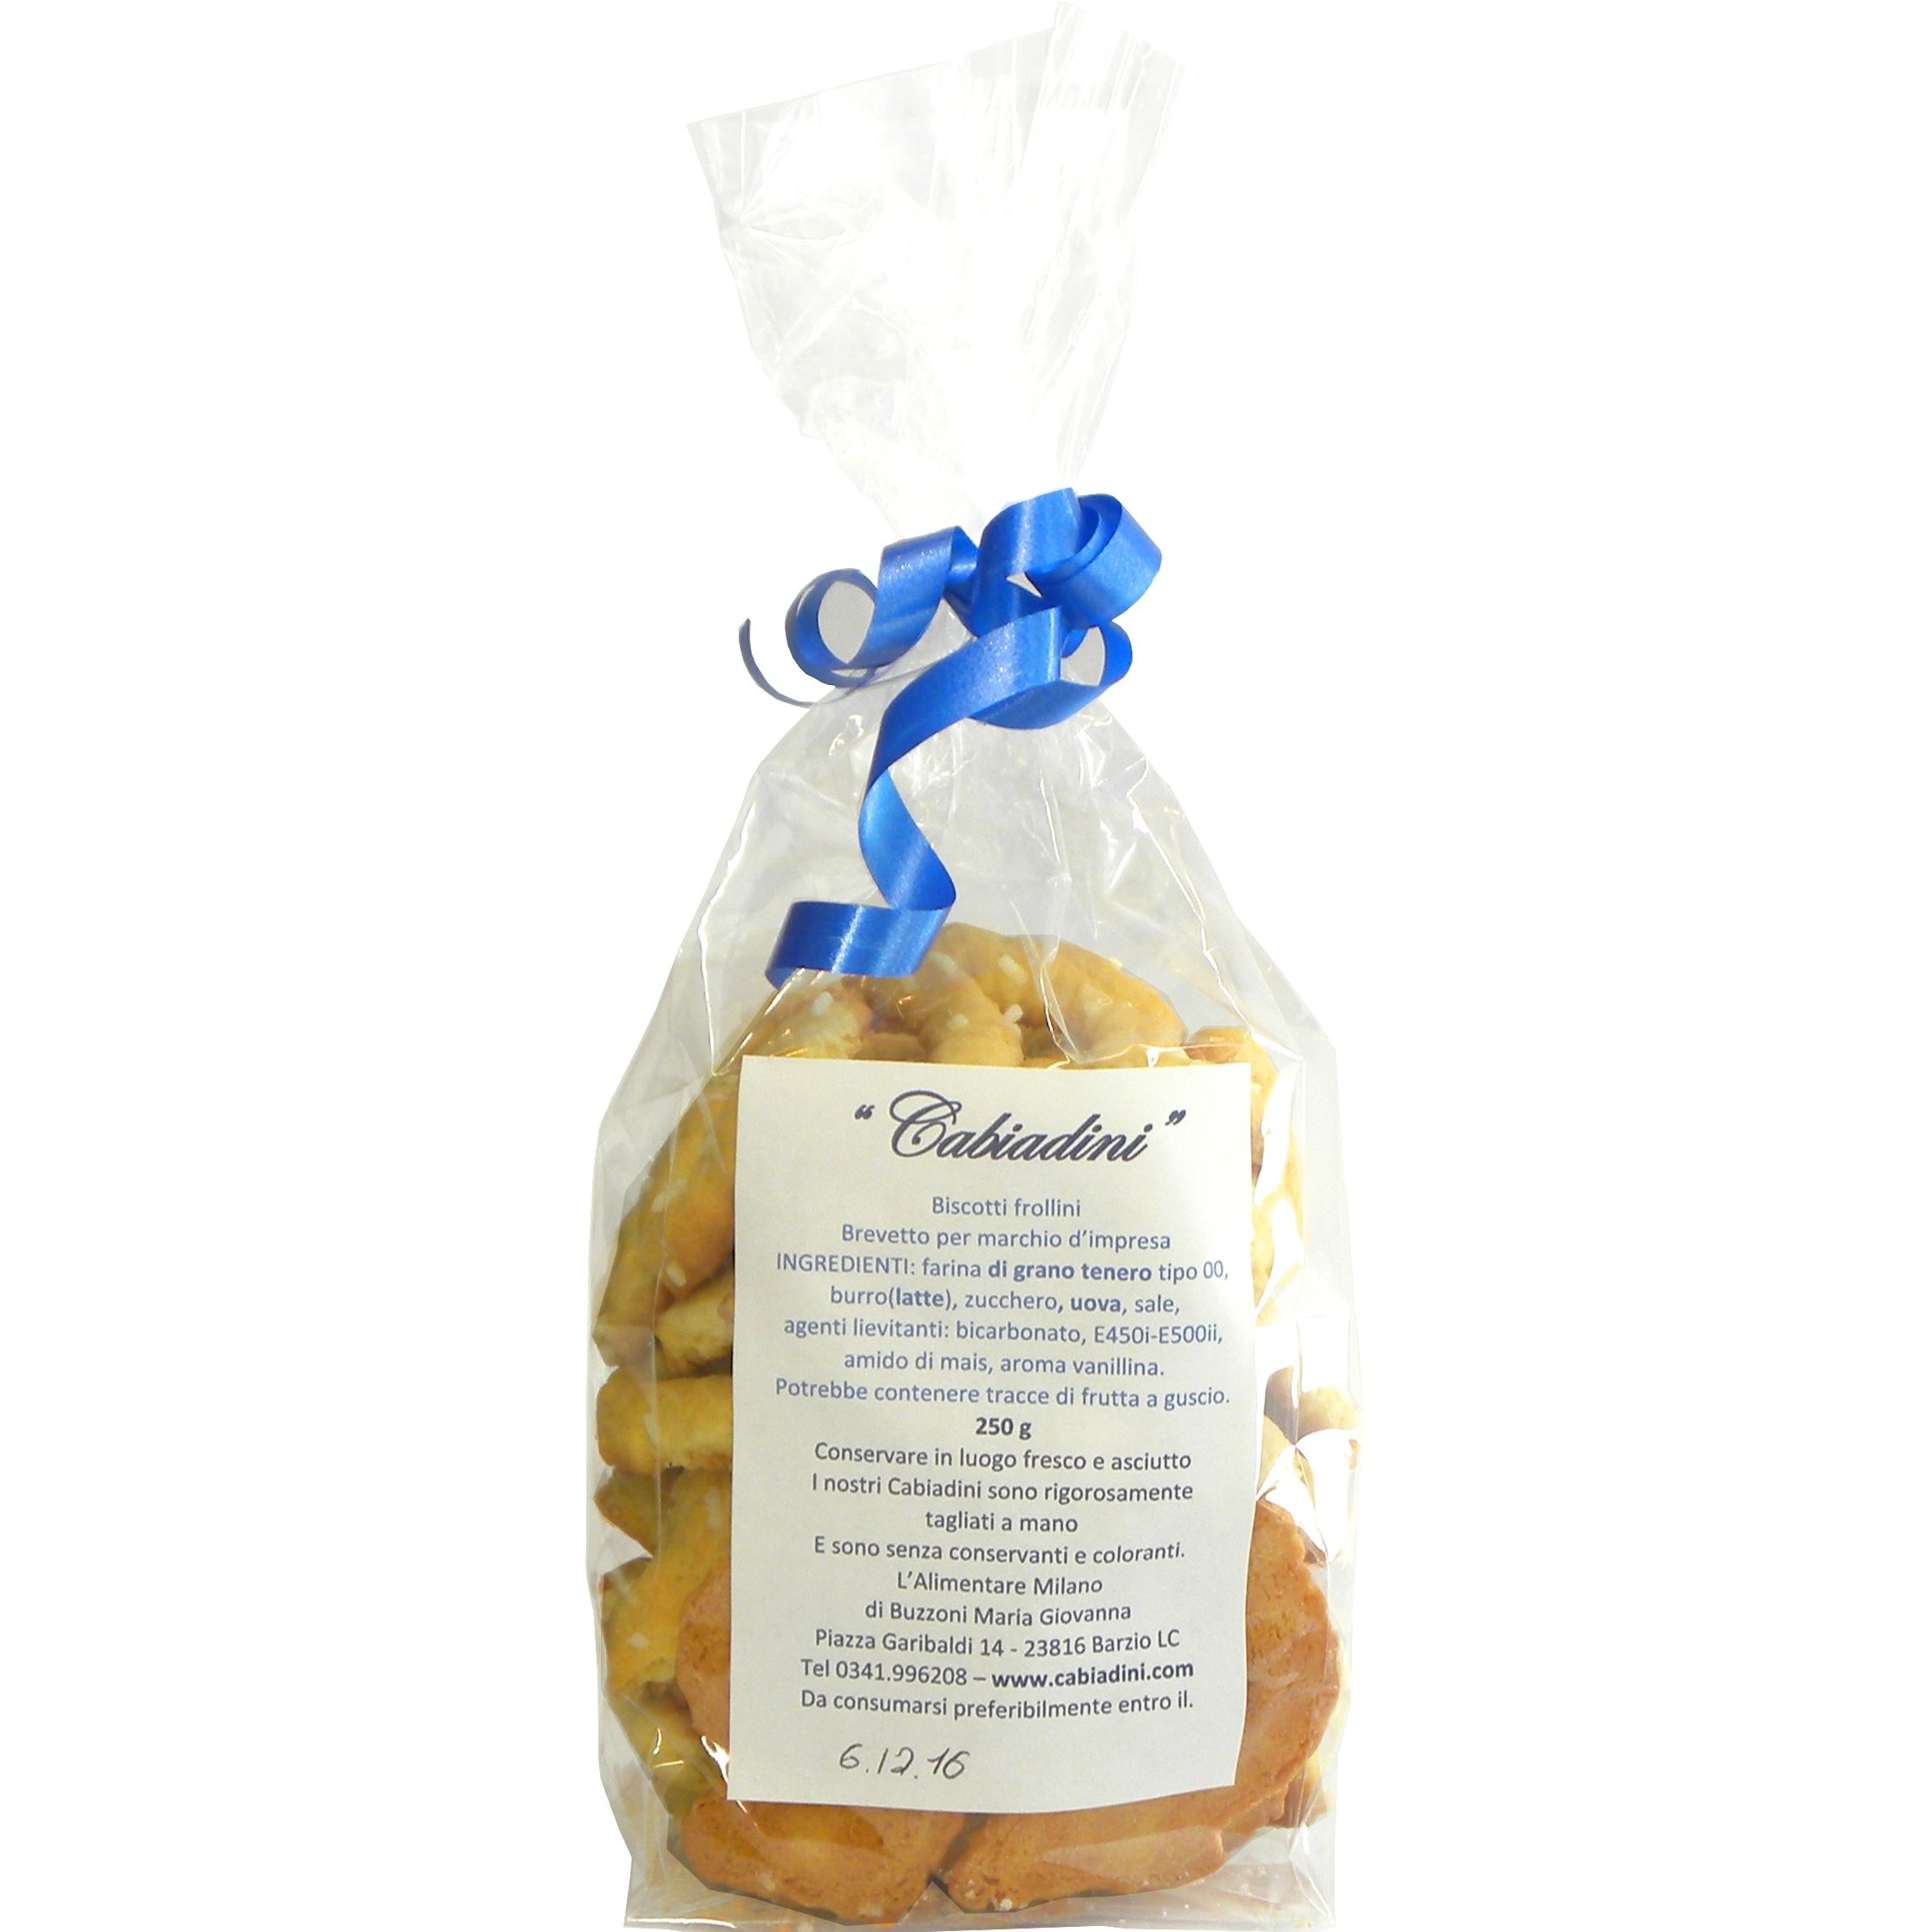 Cabiadini Biscotti 250 g- Cabiadini cookies 250 g – Gustorotondo – Italian food boutique